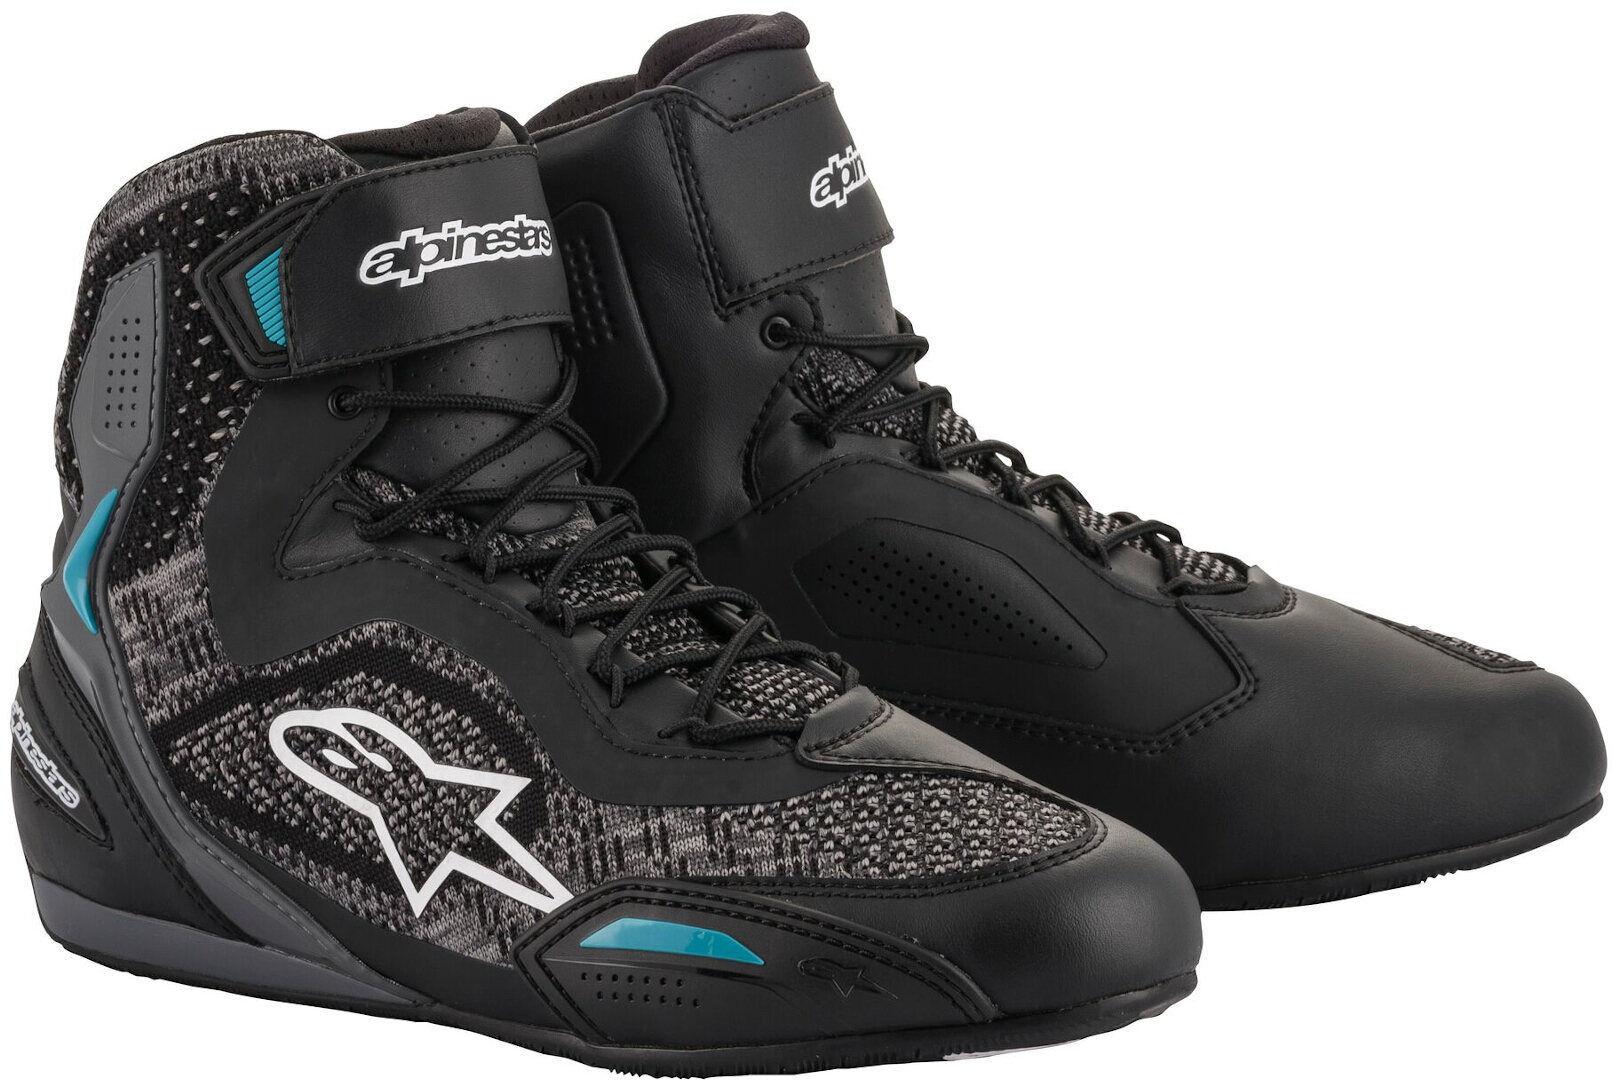 Alpinestars Stella Faster 3 Rideknit Chaussures de moto dames Noir Blanc Bleu taille : 37 38